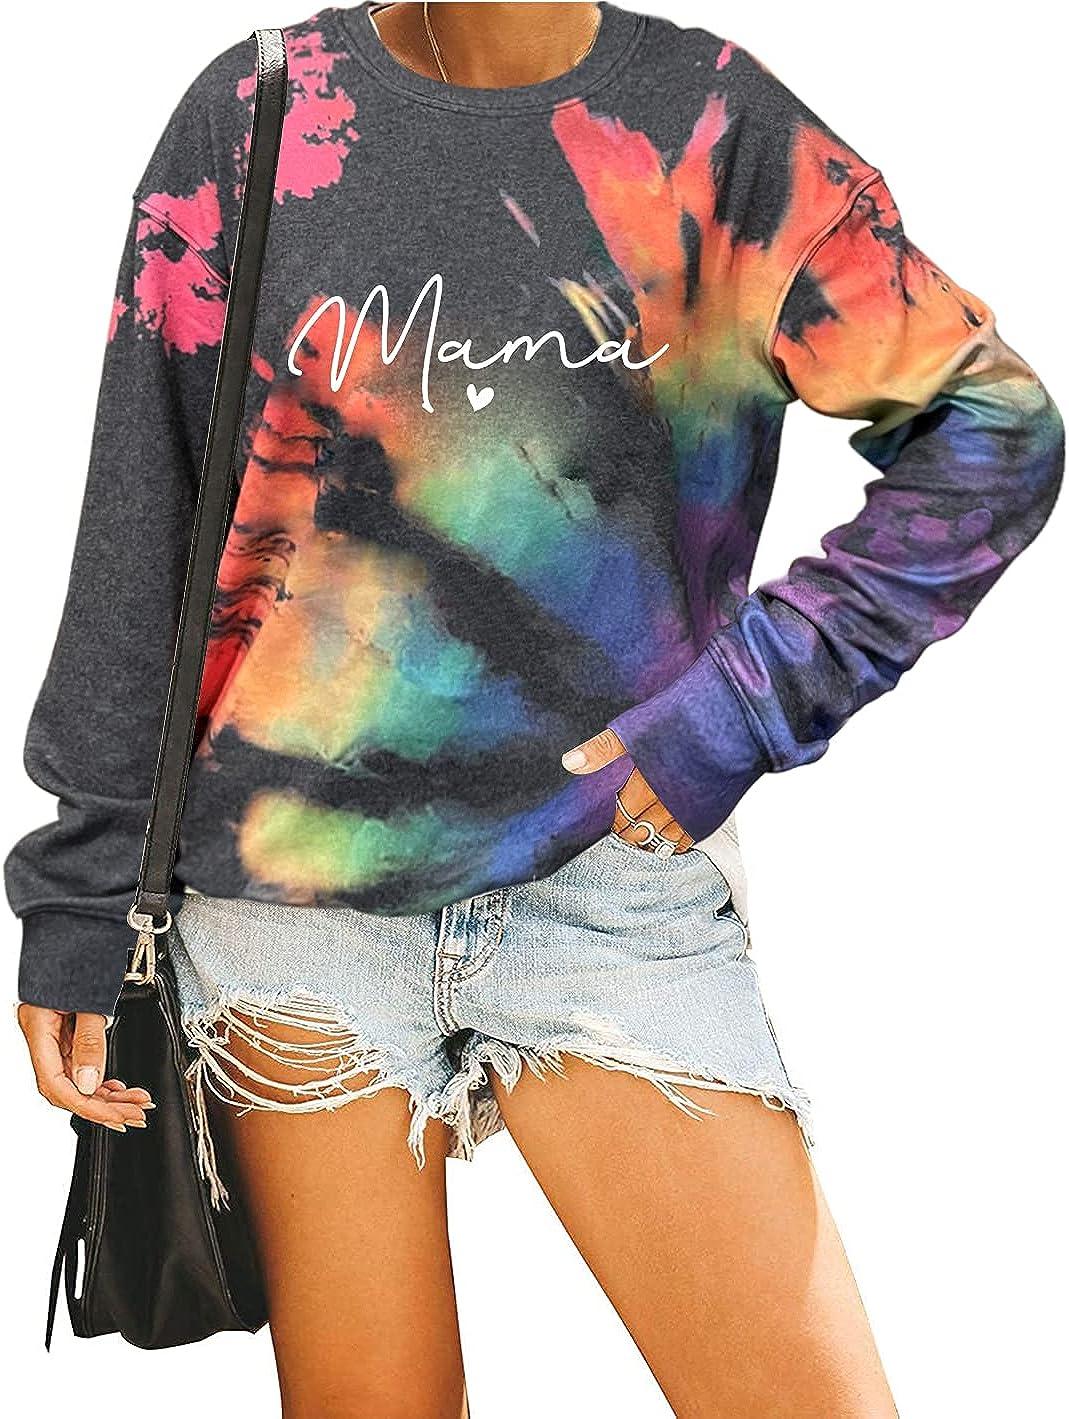 Mama Sweatshirt For Women Reverse Tie Dye Rainbow Fall Crewneck Sweatshirt Funny Mother Gifts Long Sleeve Pullover Tops